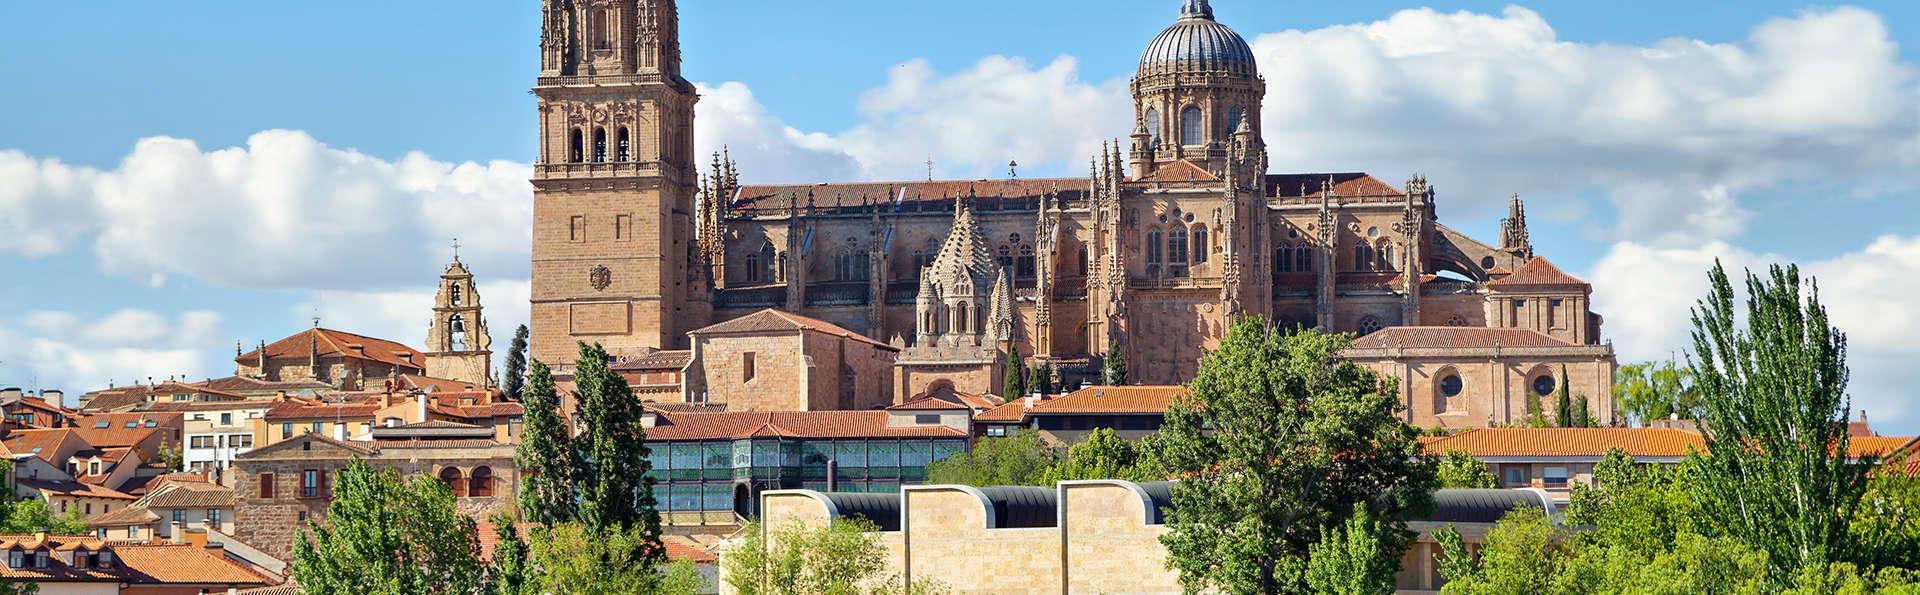 Hotel Salamanca Montalvo - Edit_Salamanca2.jpg